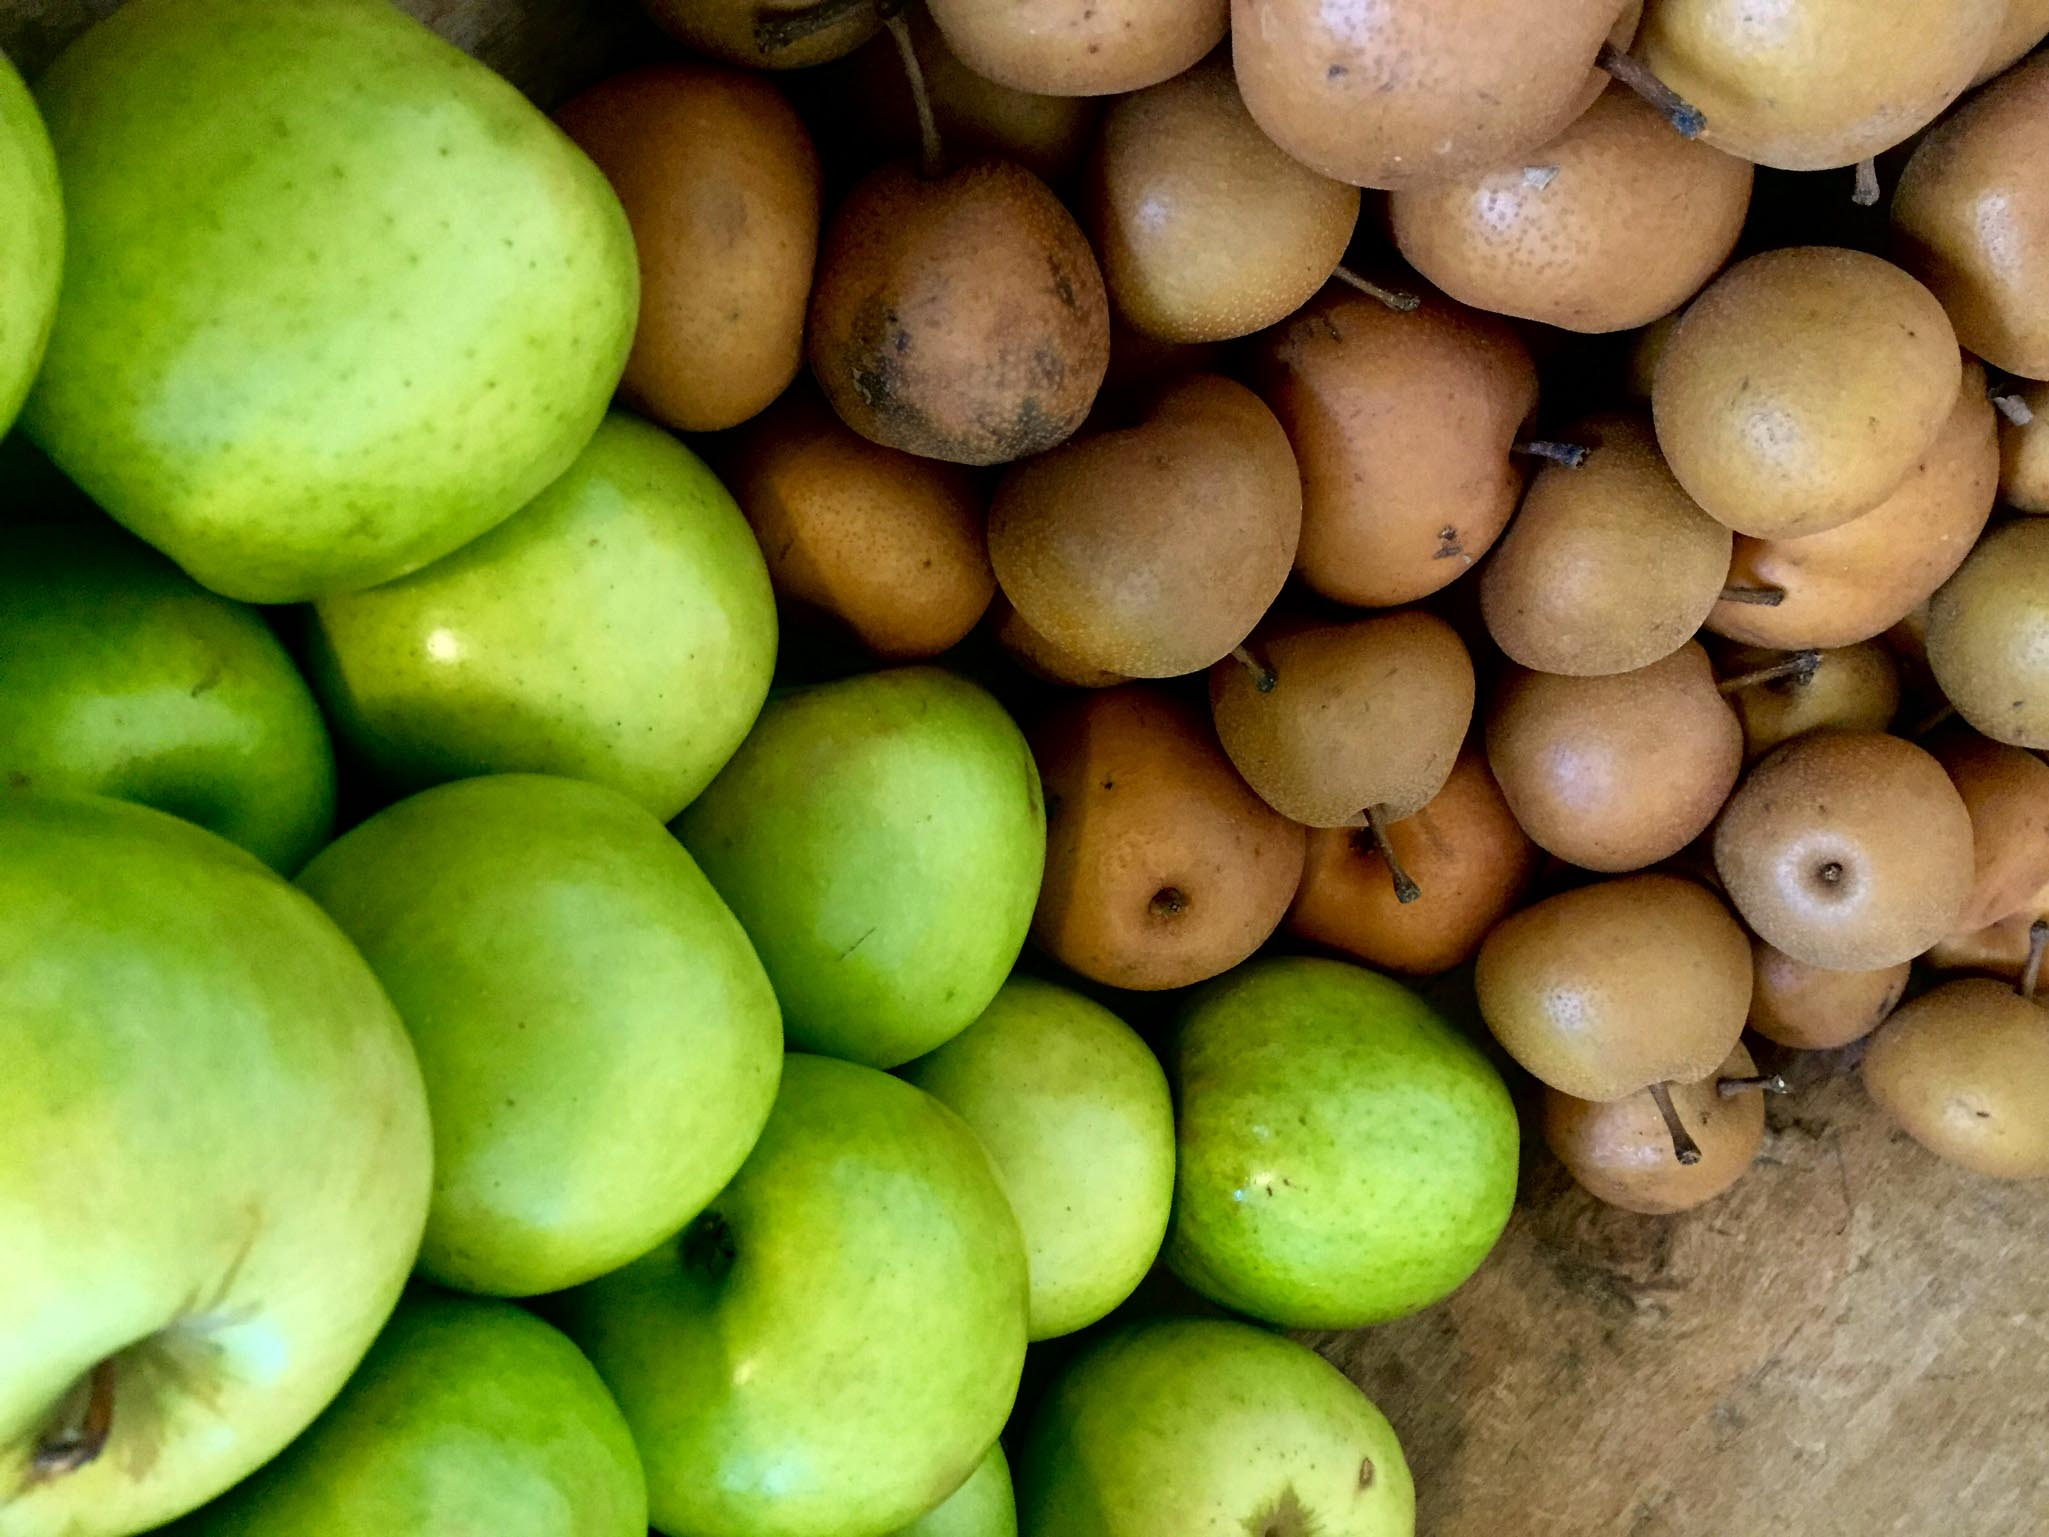 Motsu Apples & Pears - Stone Hollow Farmstead CSA